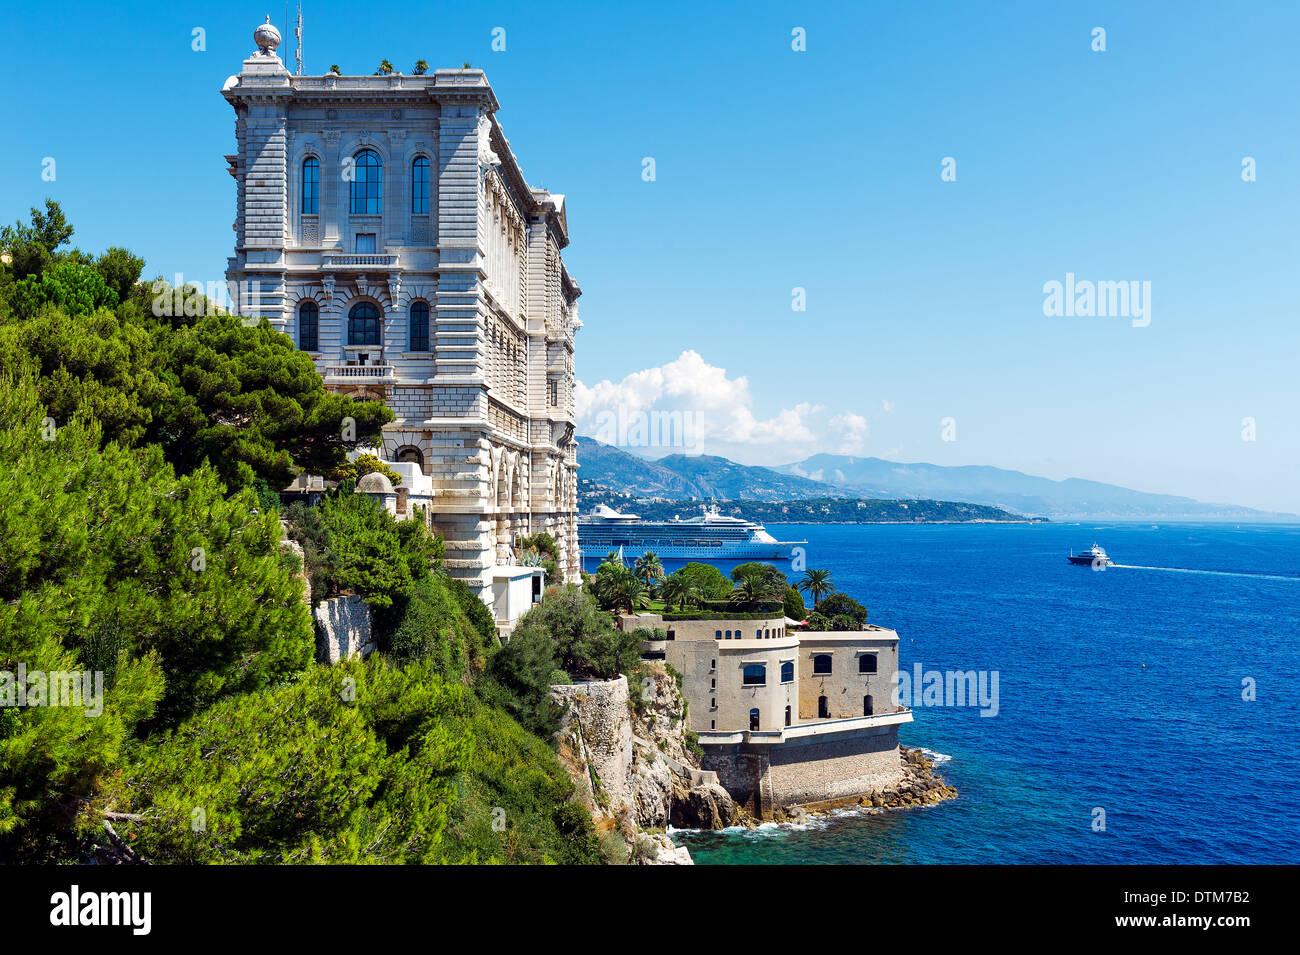 Europe, France, Principality of Monaco, Monte Carlo. Oceanographic museum. - Stock Image